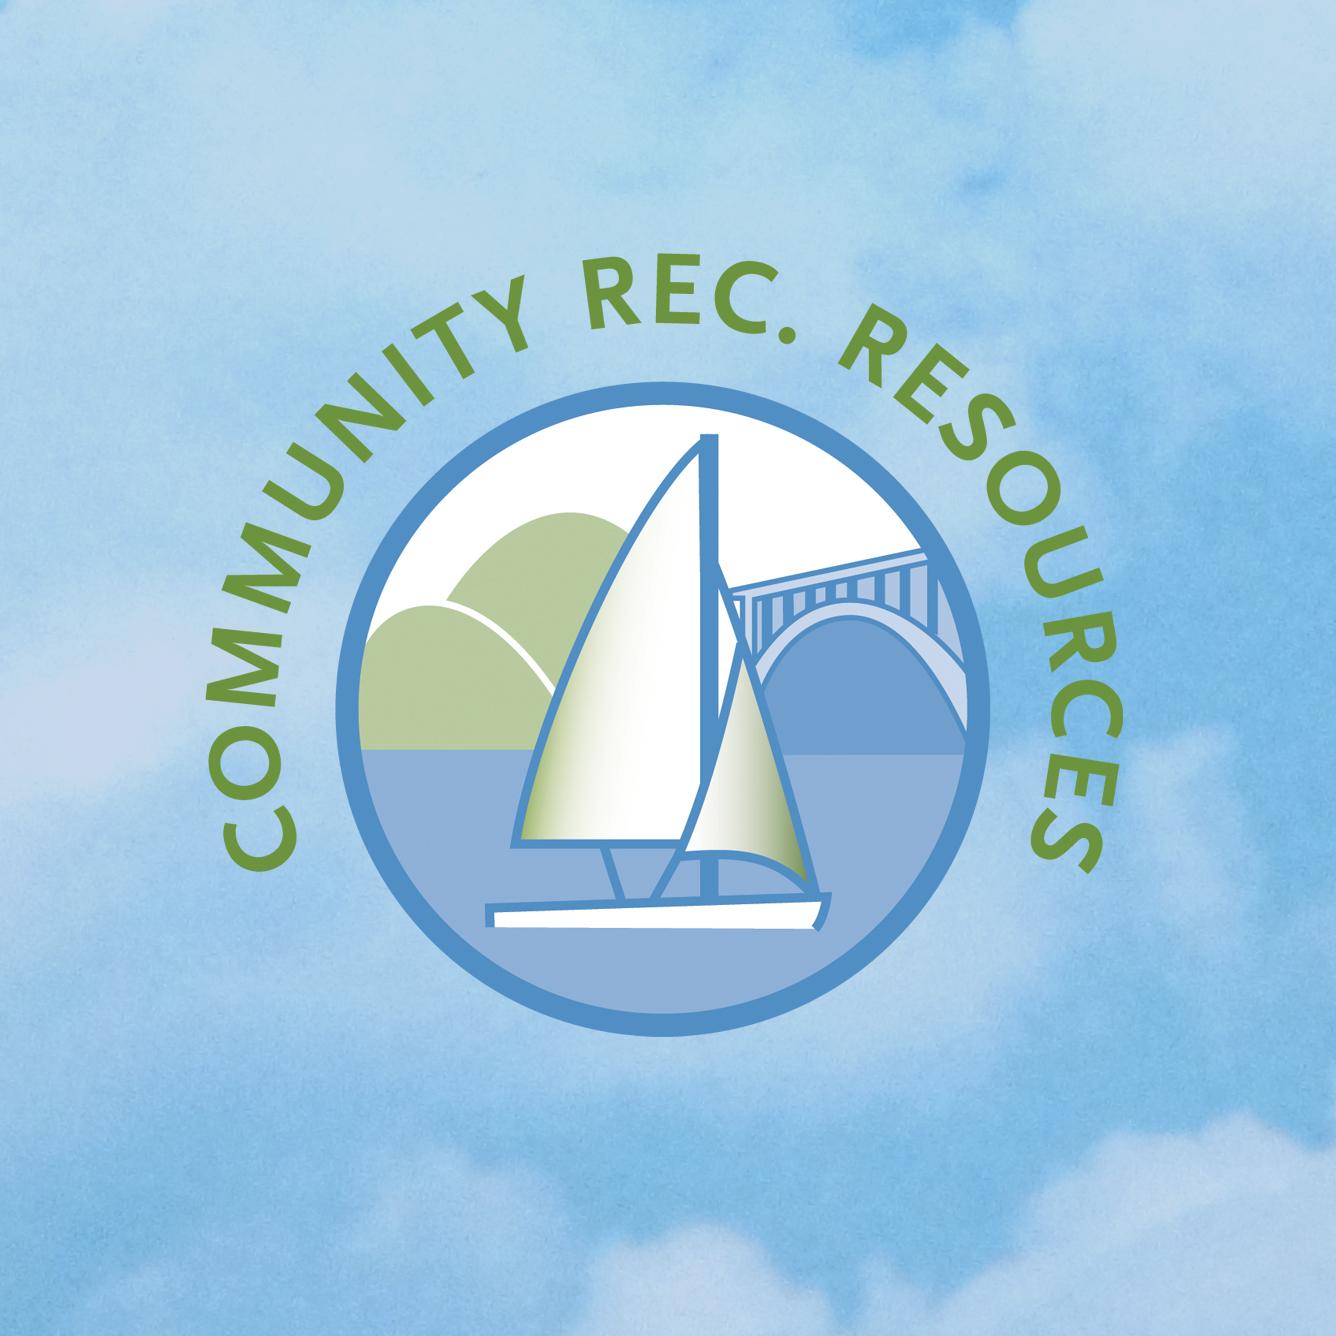 Sommerset Design - Community Rec Resources